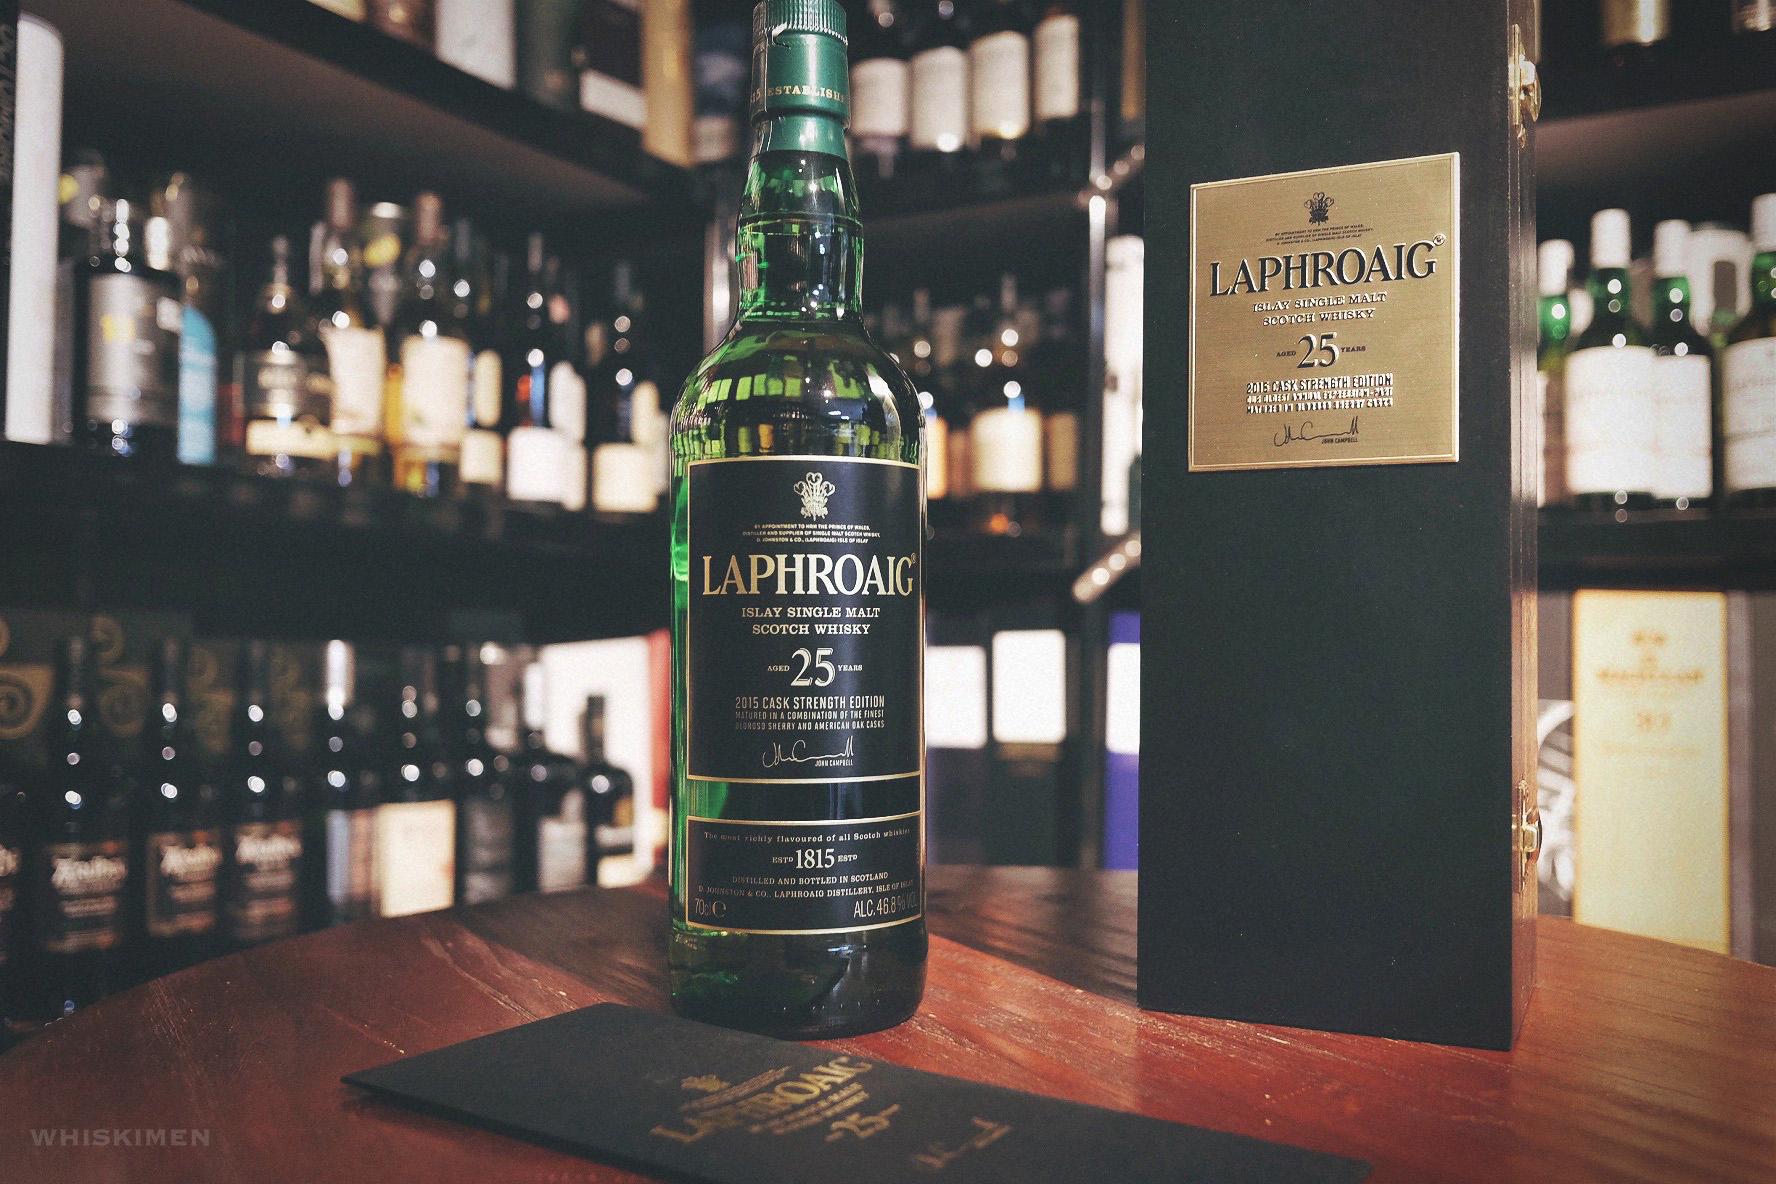 Laphroaig 25 Year Old Single Malt Scotch Whisky (2015 Edition)